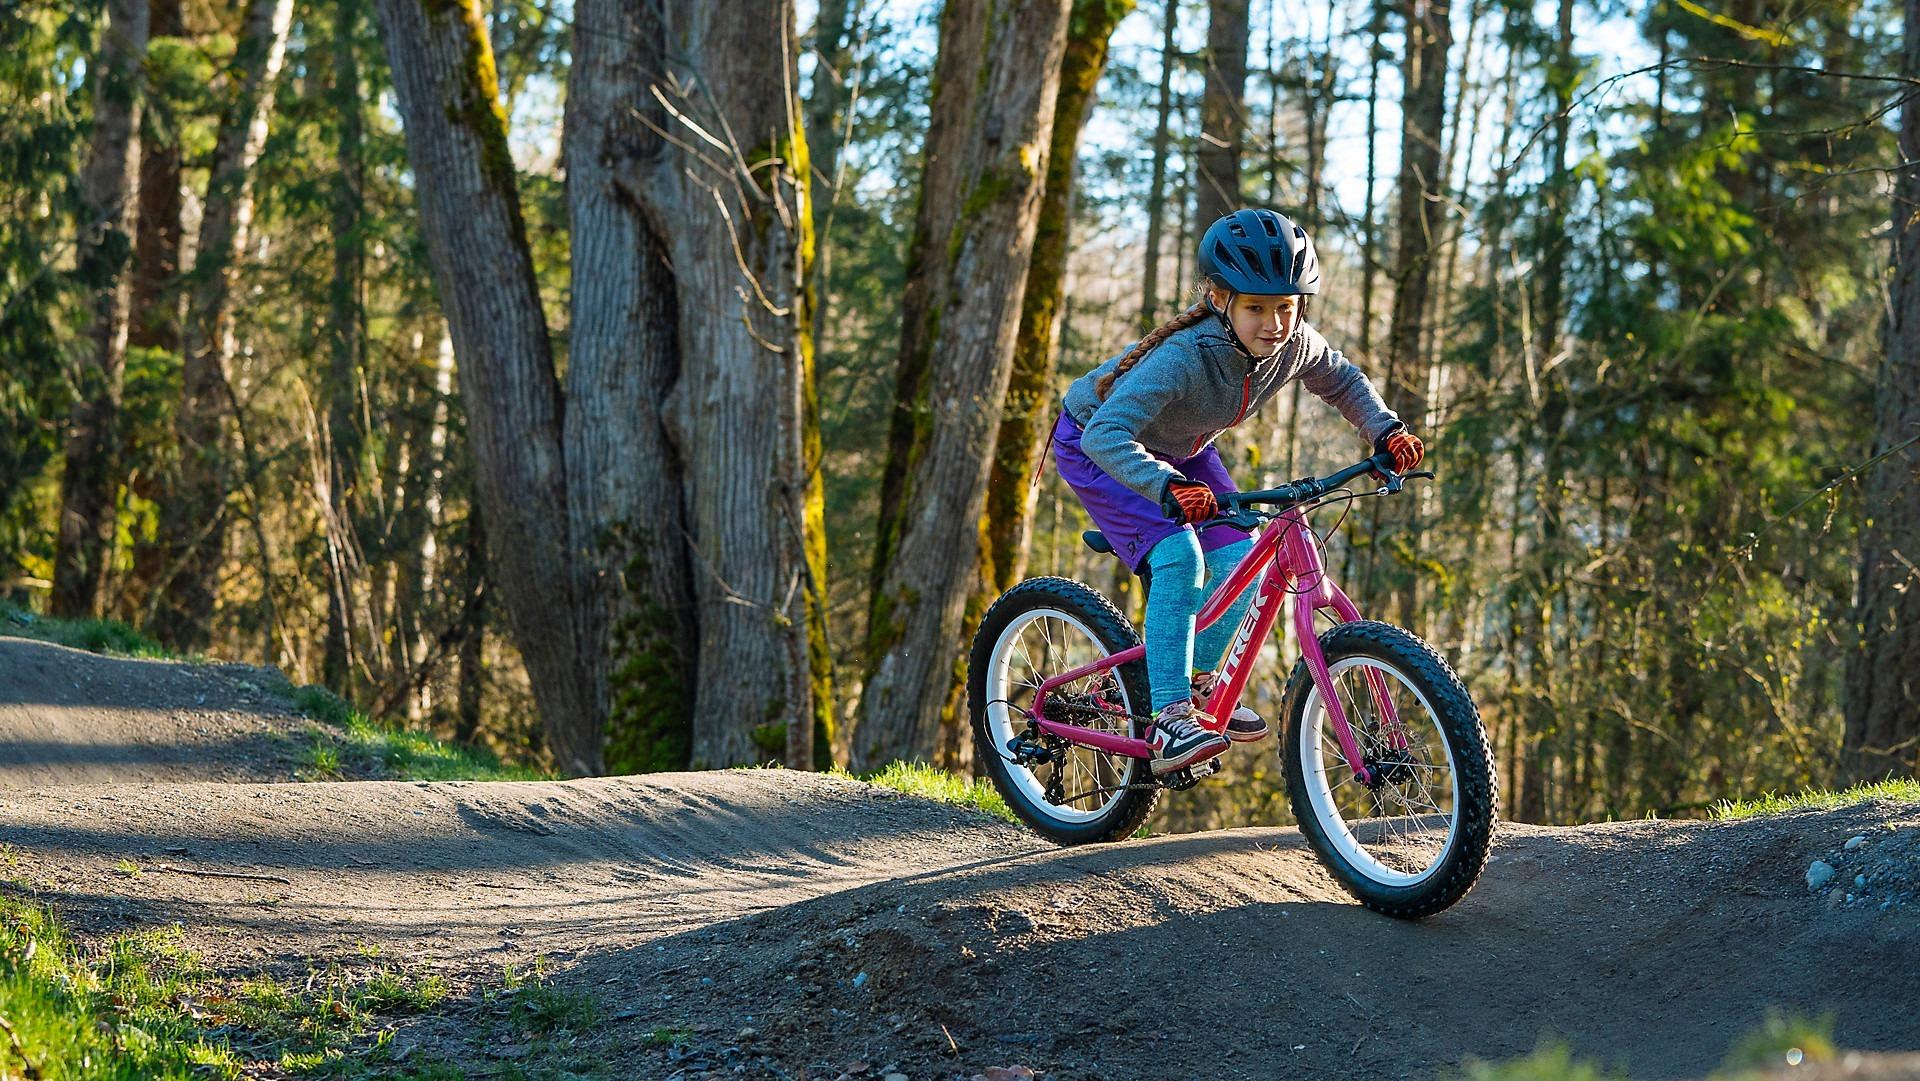 A child rides a kid's bike on a dirt trail